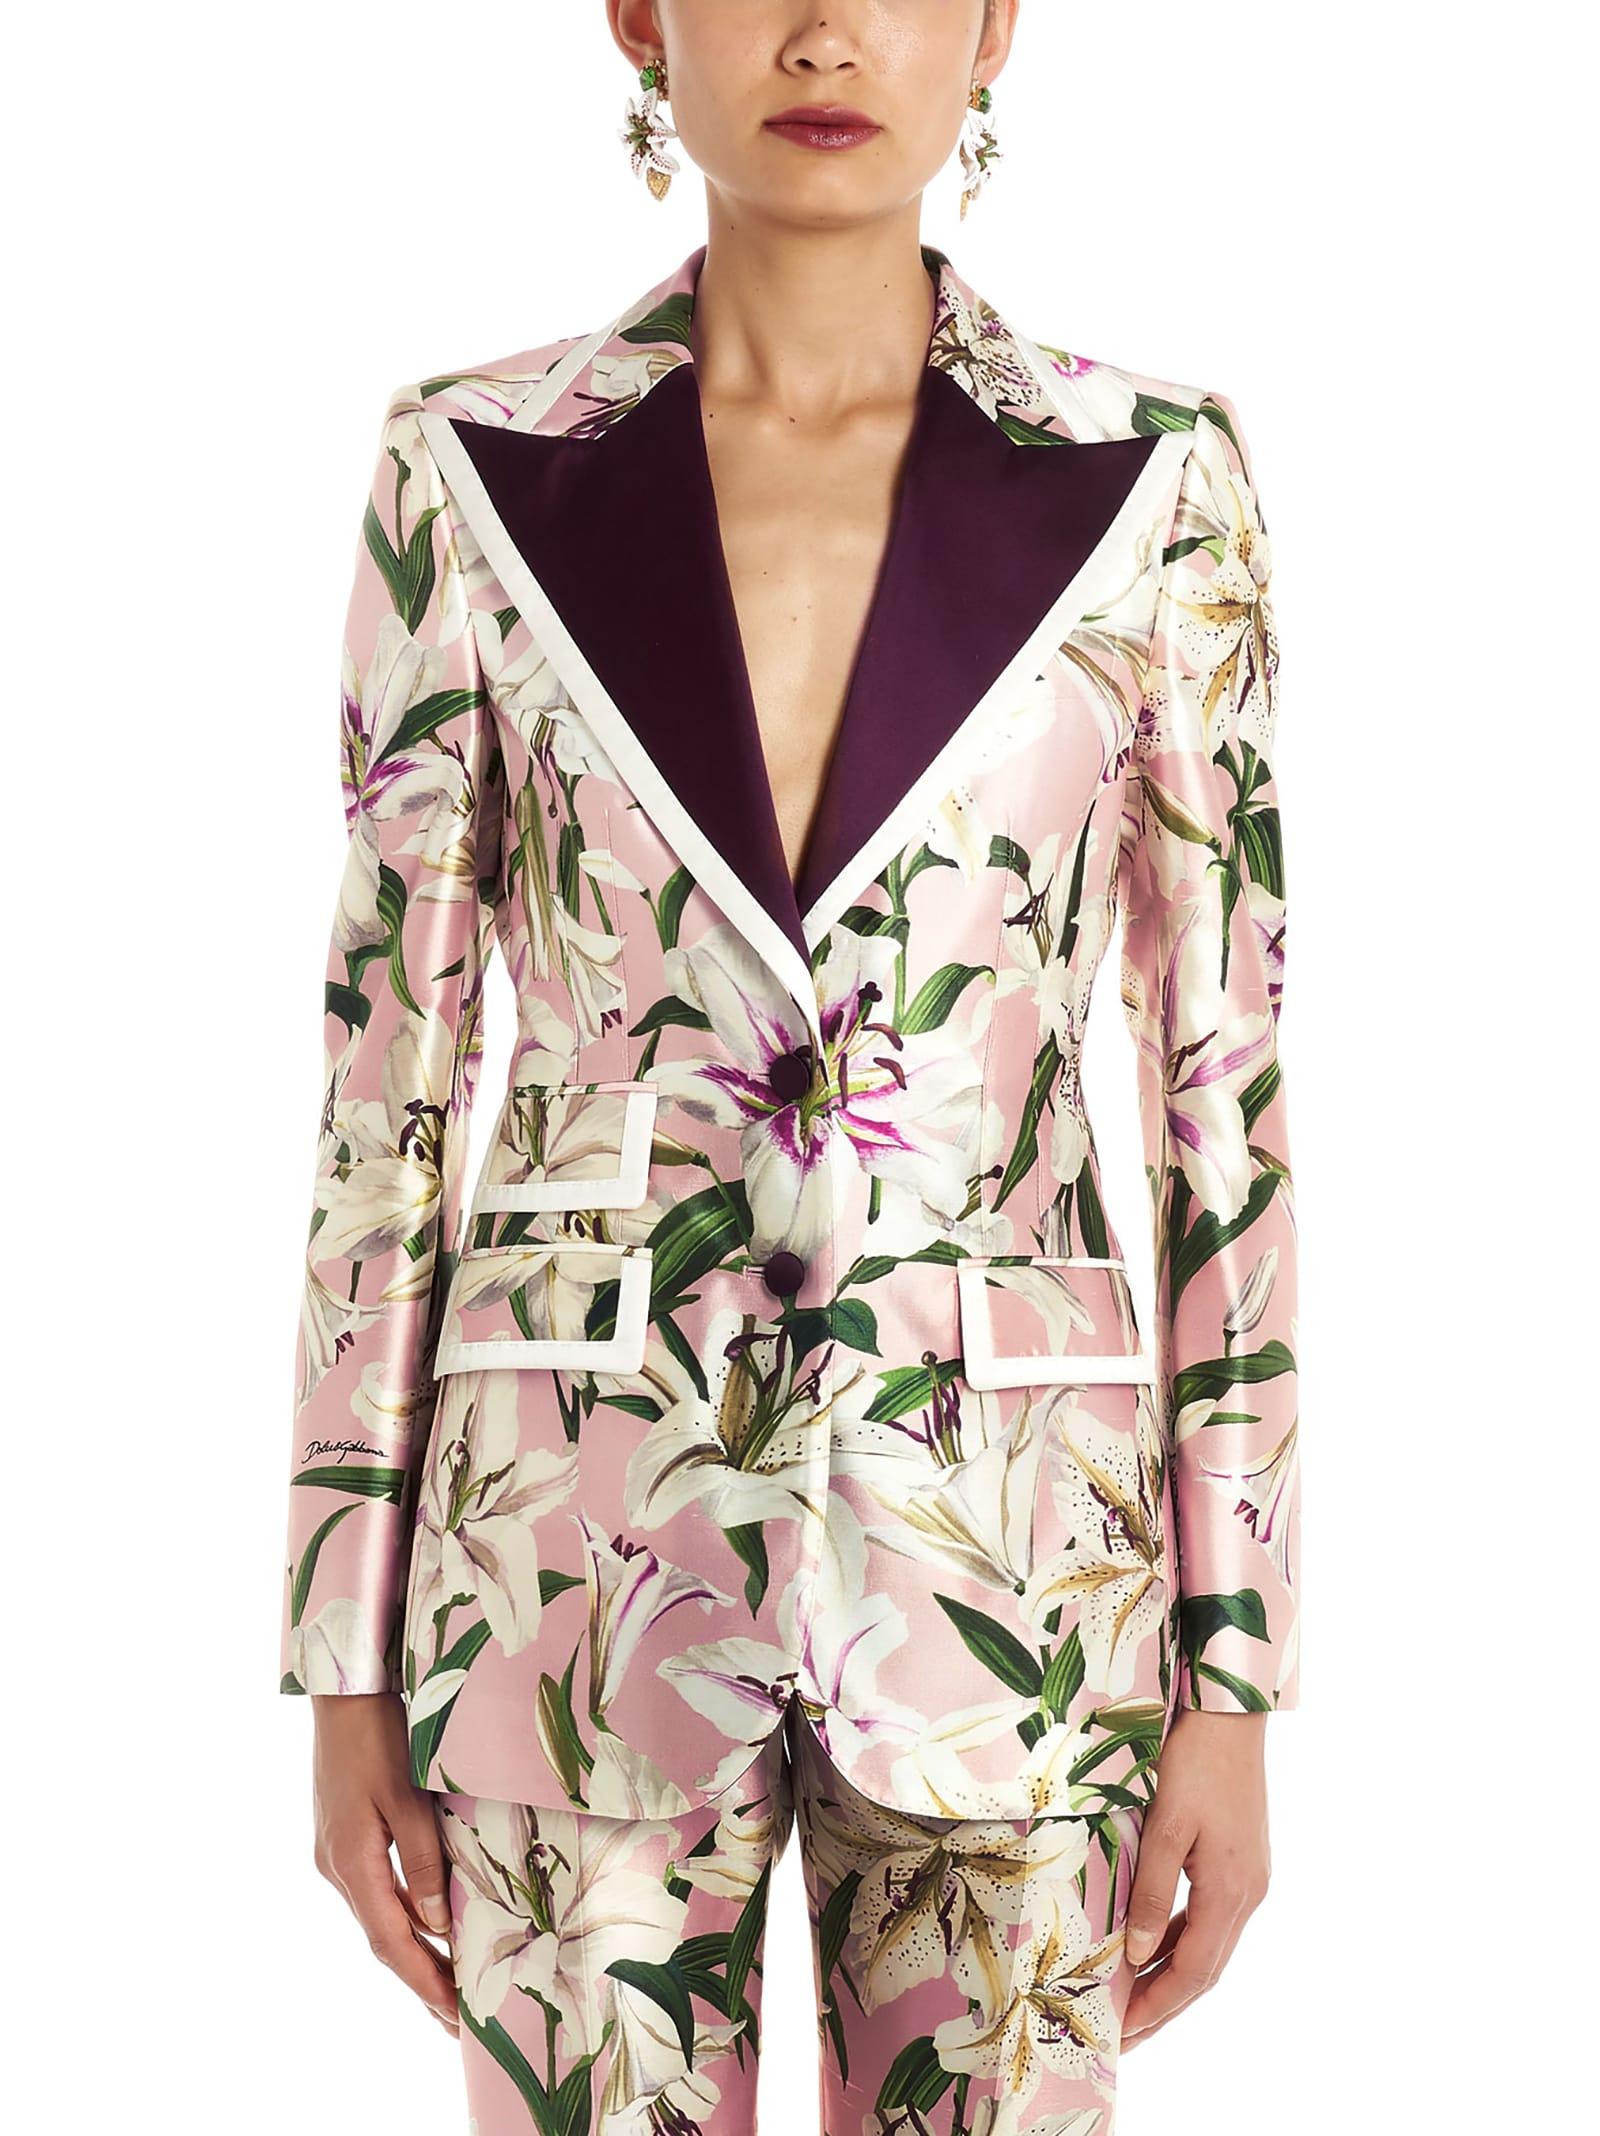 Dolce & Gabbana gigli Jacket